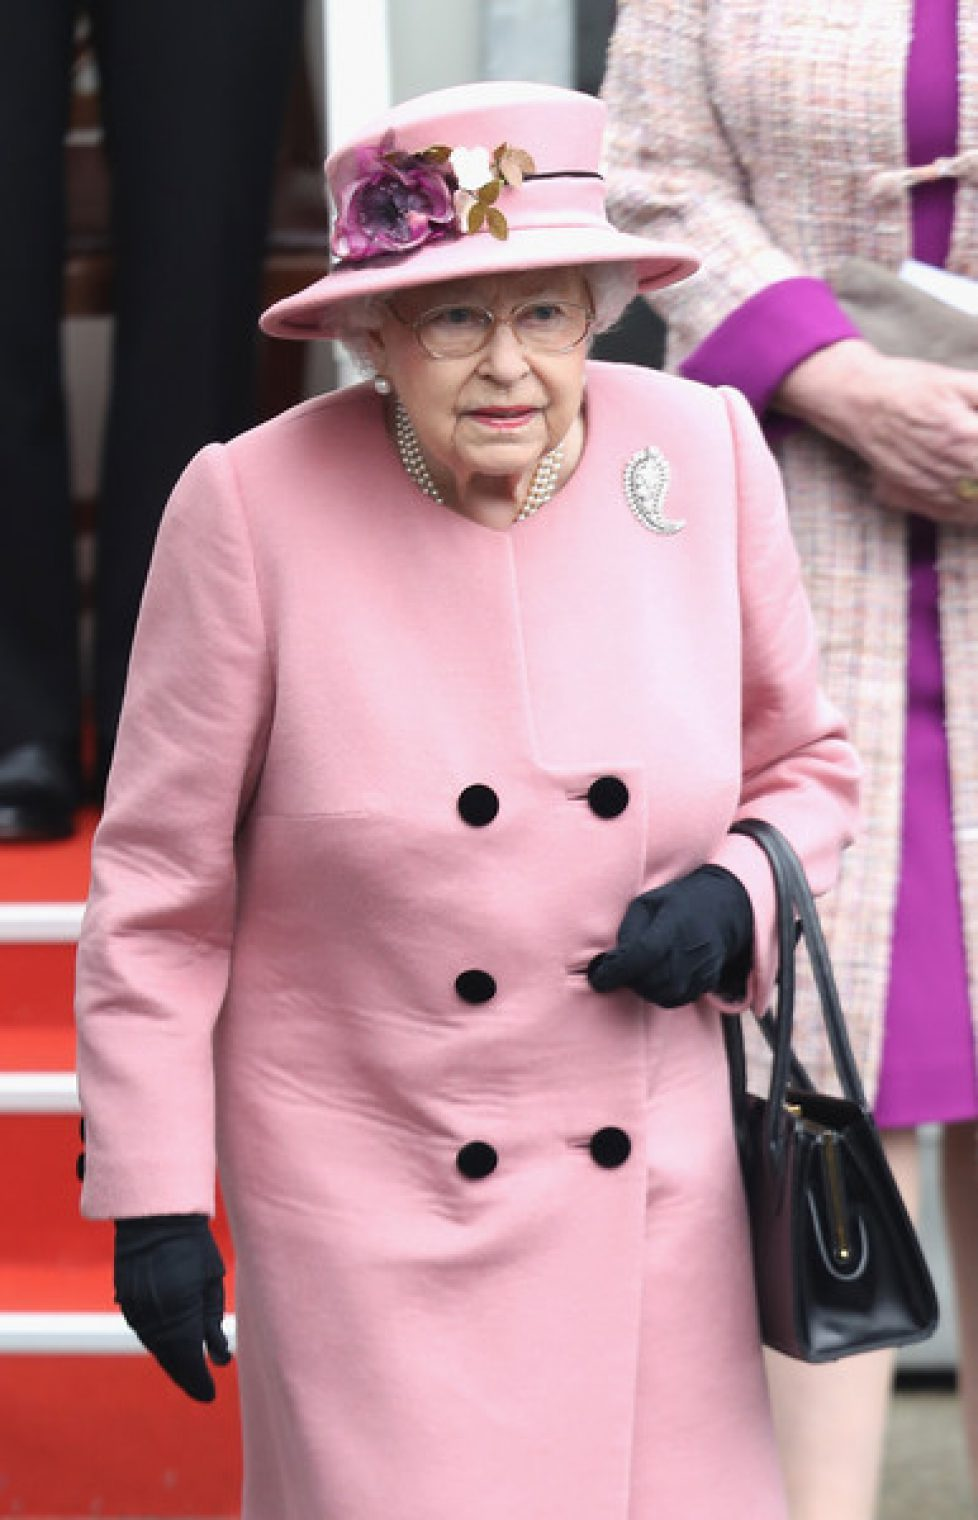 Queen+Elizabeth+II+Attends+Decommissioning+qEuSM4iF0VUl